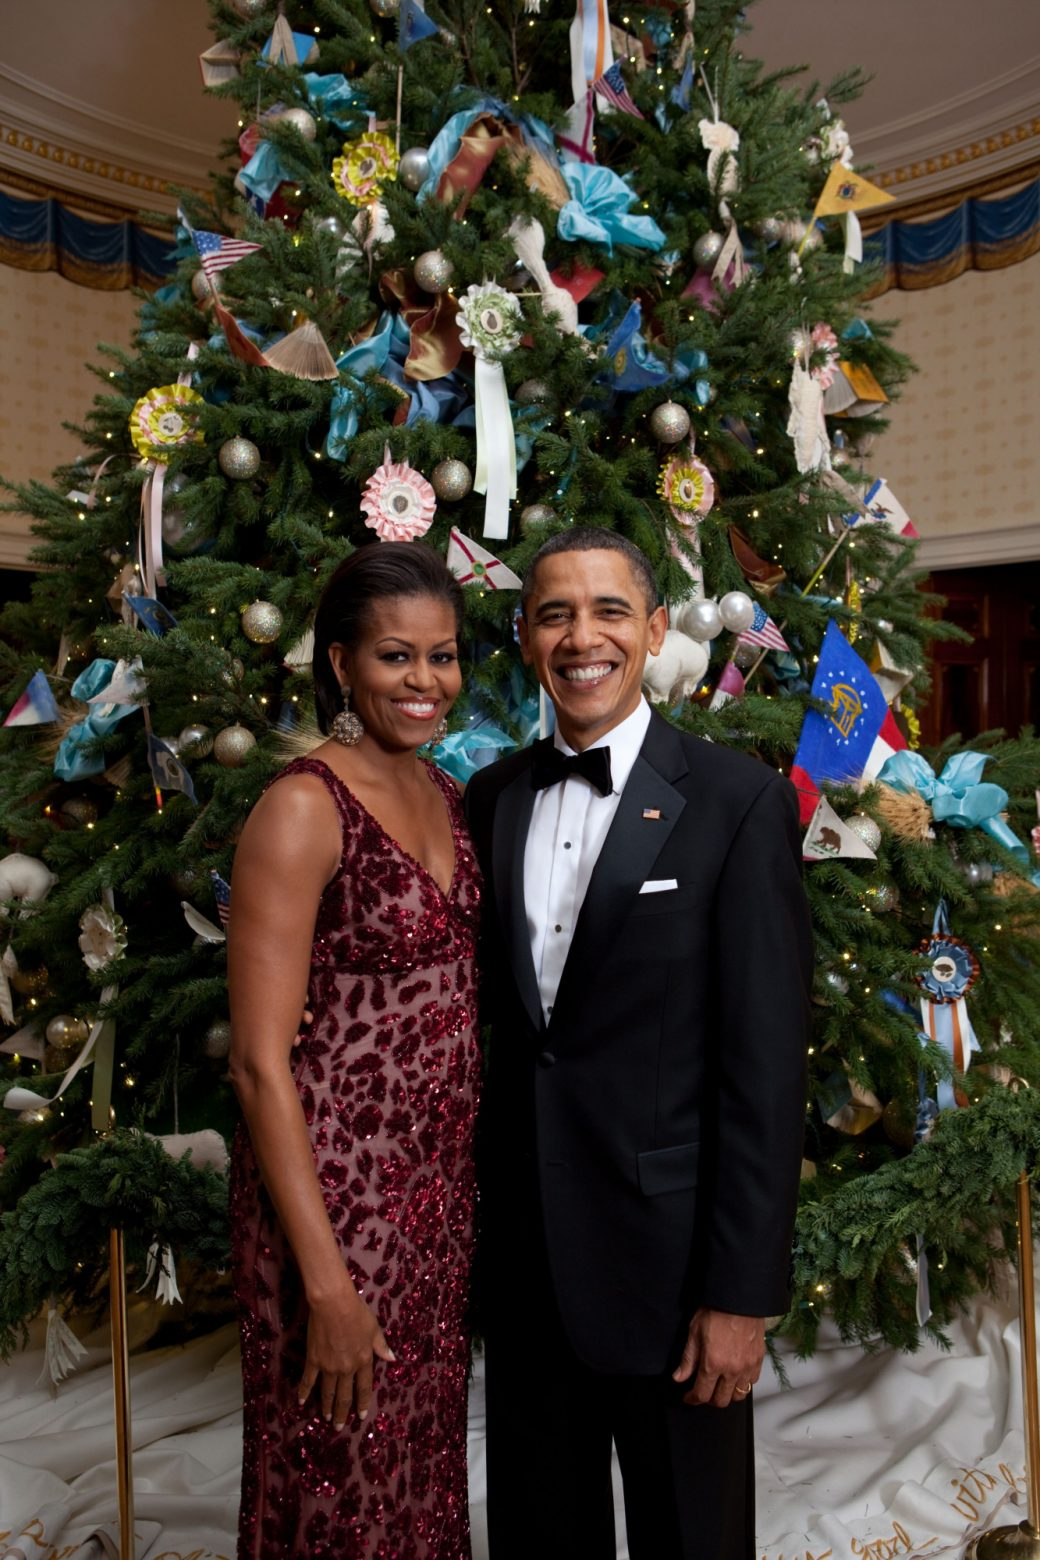 Obama Christmas.Christmas Themes Michelle Obama Celebrates With The